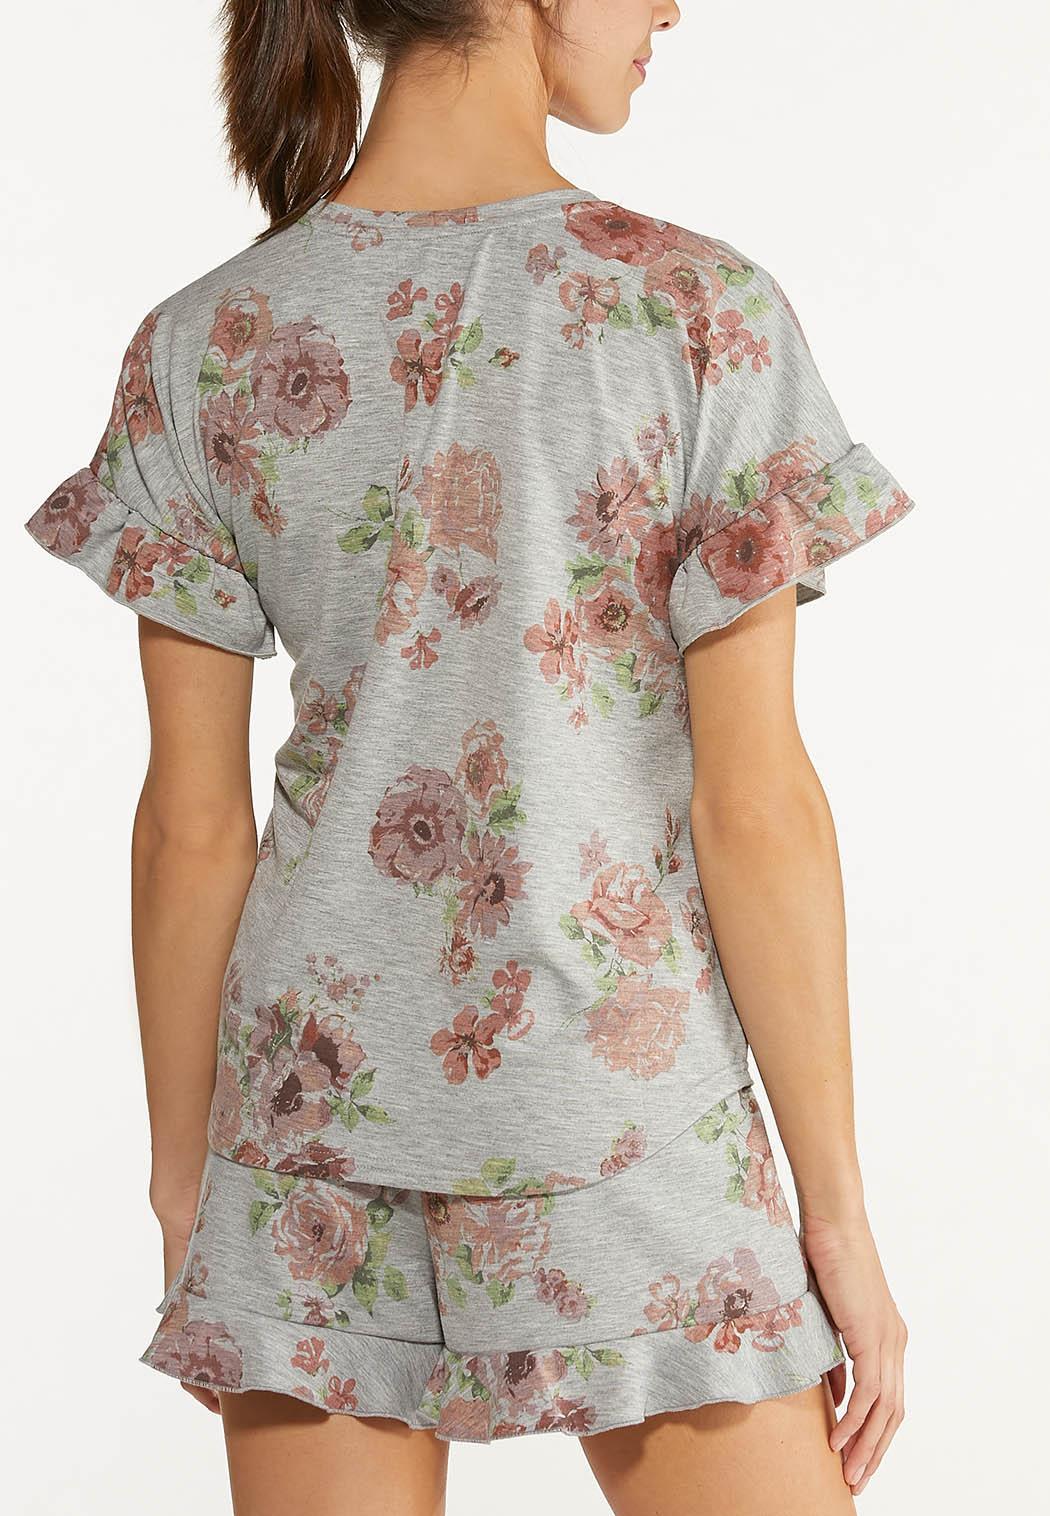 Ruffled Floral Tee (Item #44613987)